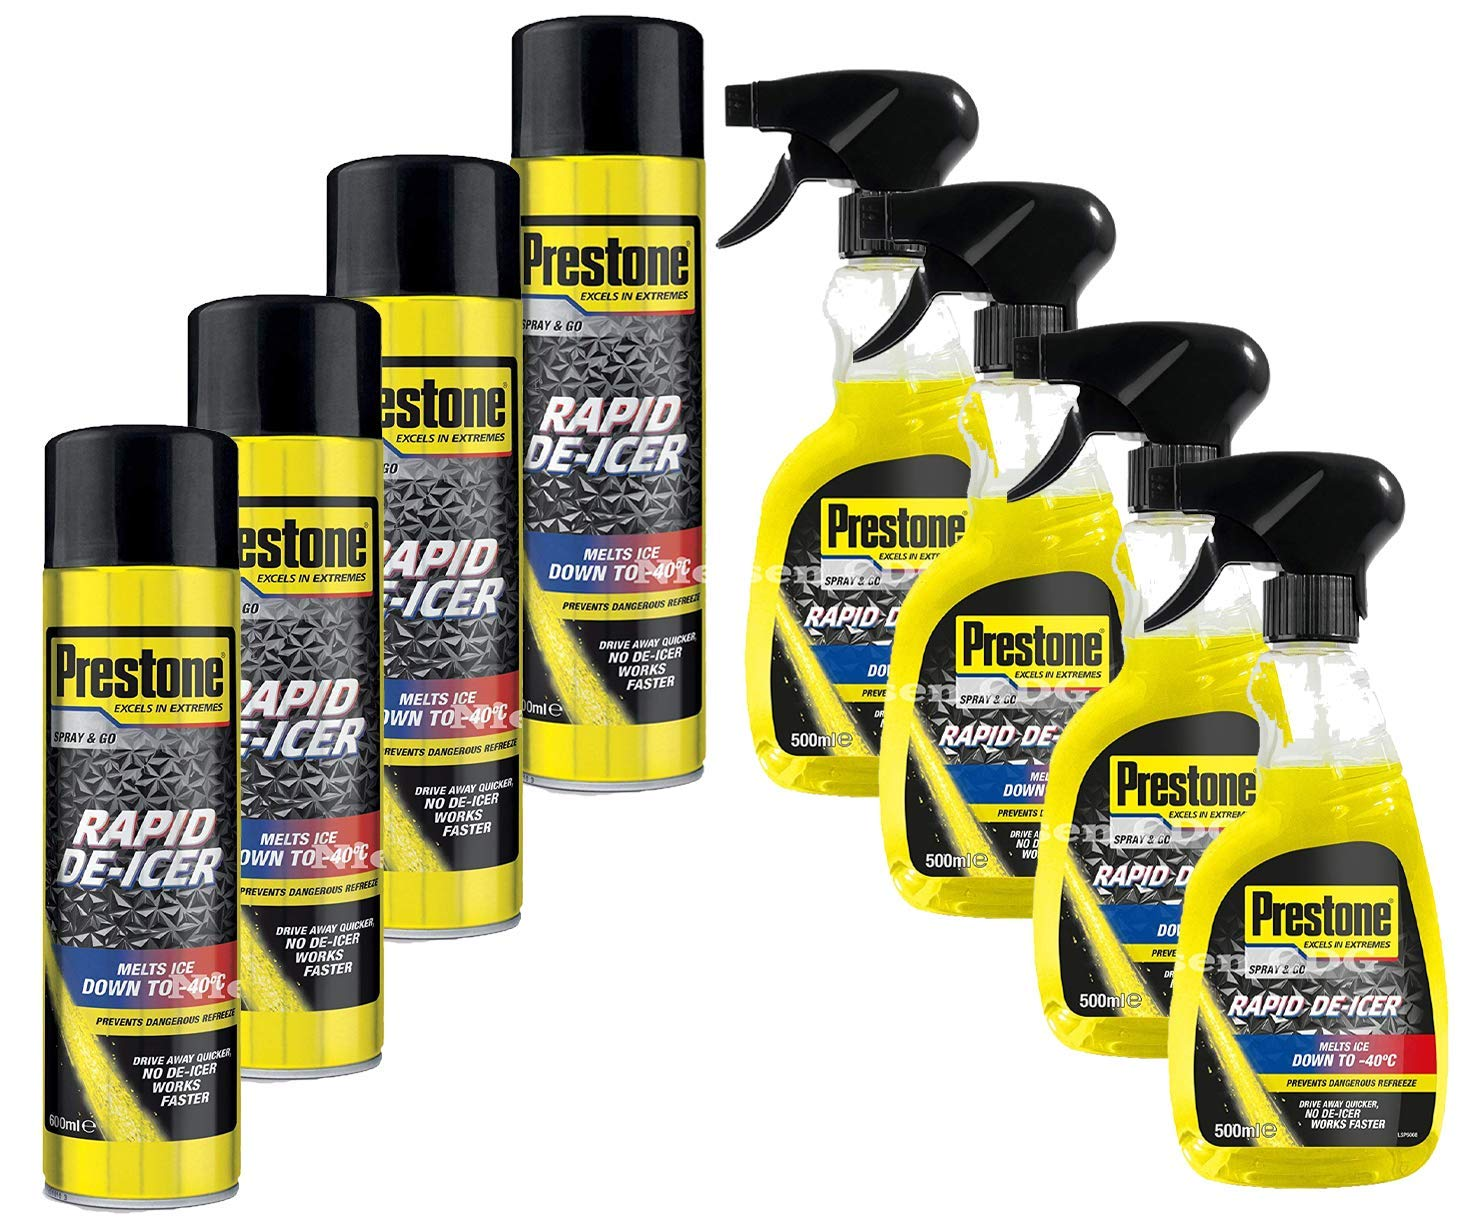 Prestone Trigger De-Icer 500ml x4 + Spray Can 600ml x4